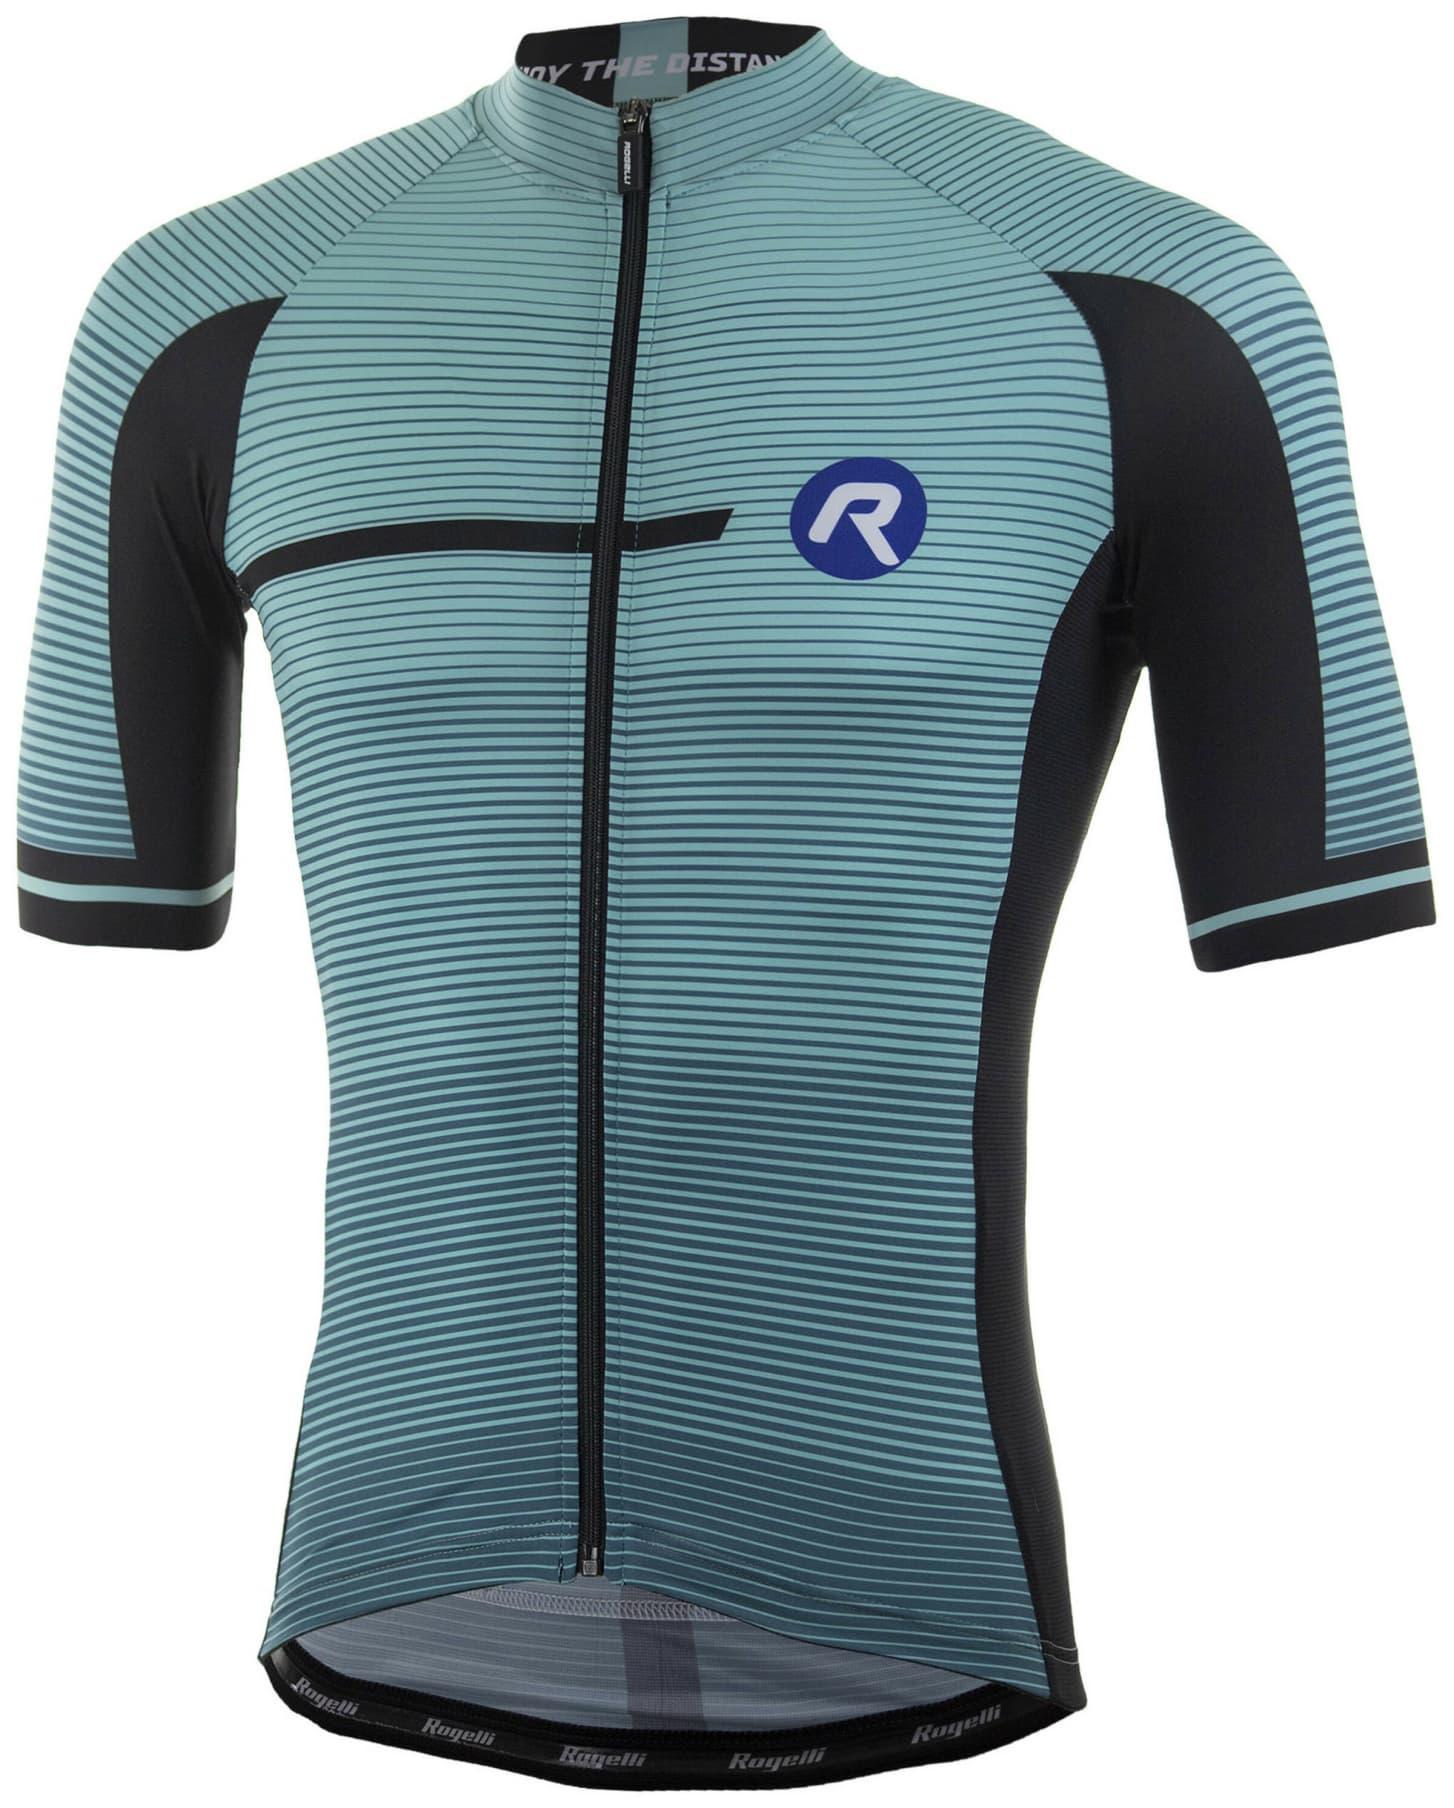 Aerodynamiczna koszulka kolarska Rogelli PENDENZA z krótkim